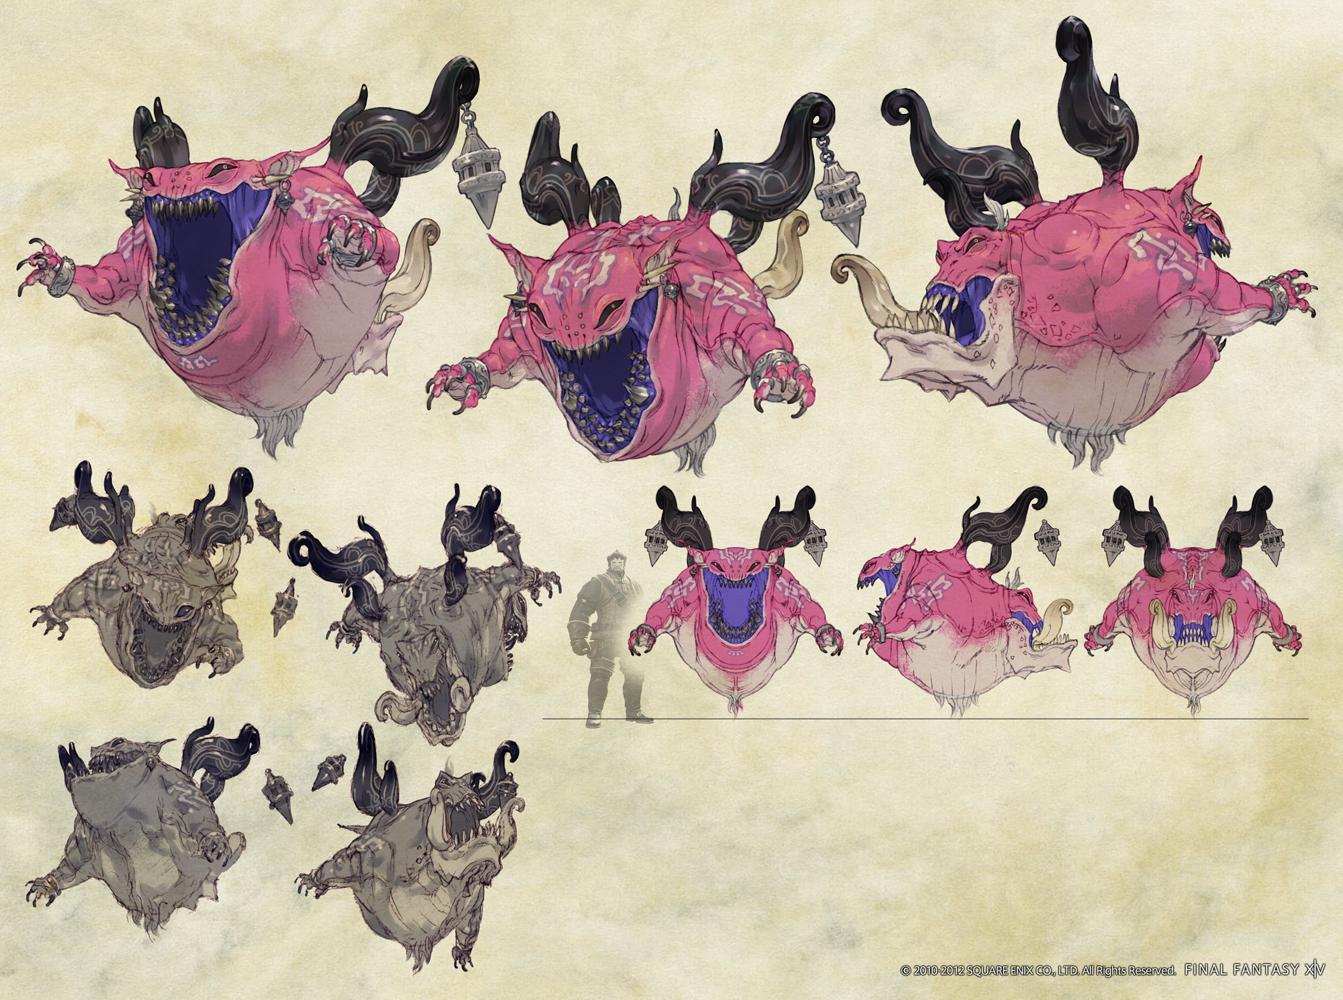 Final Fantasy x Artwork Typhon Artwork For Final